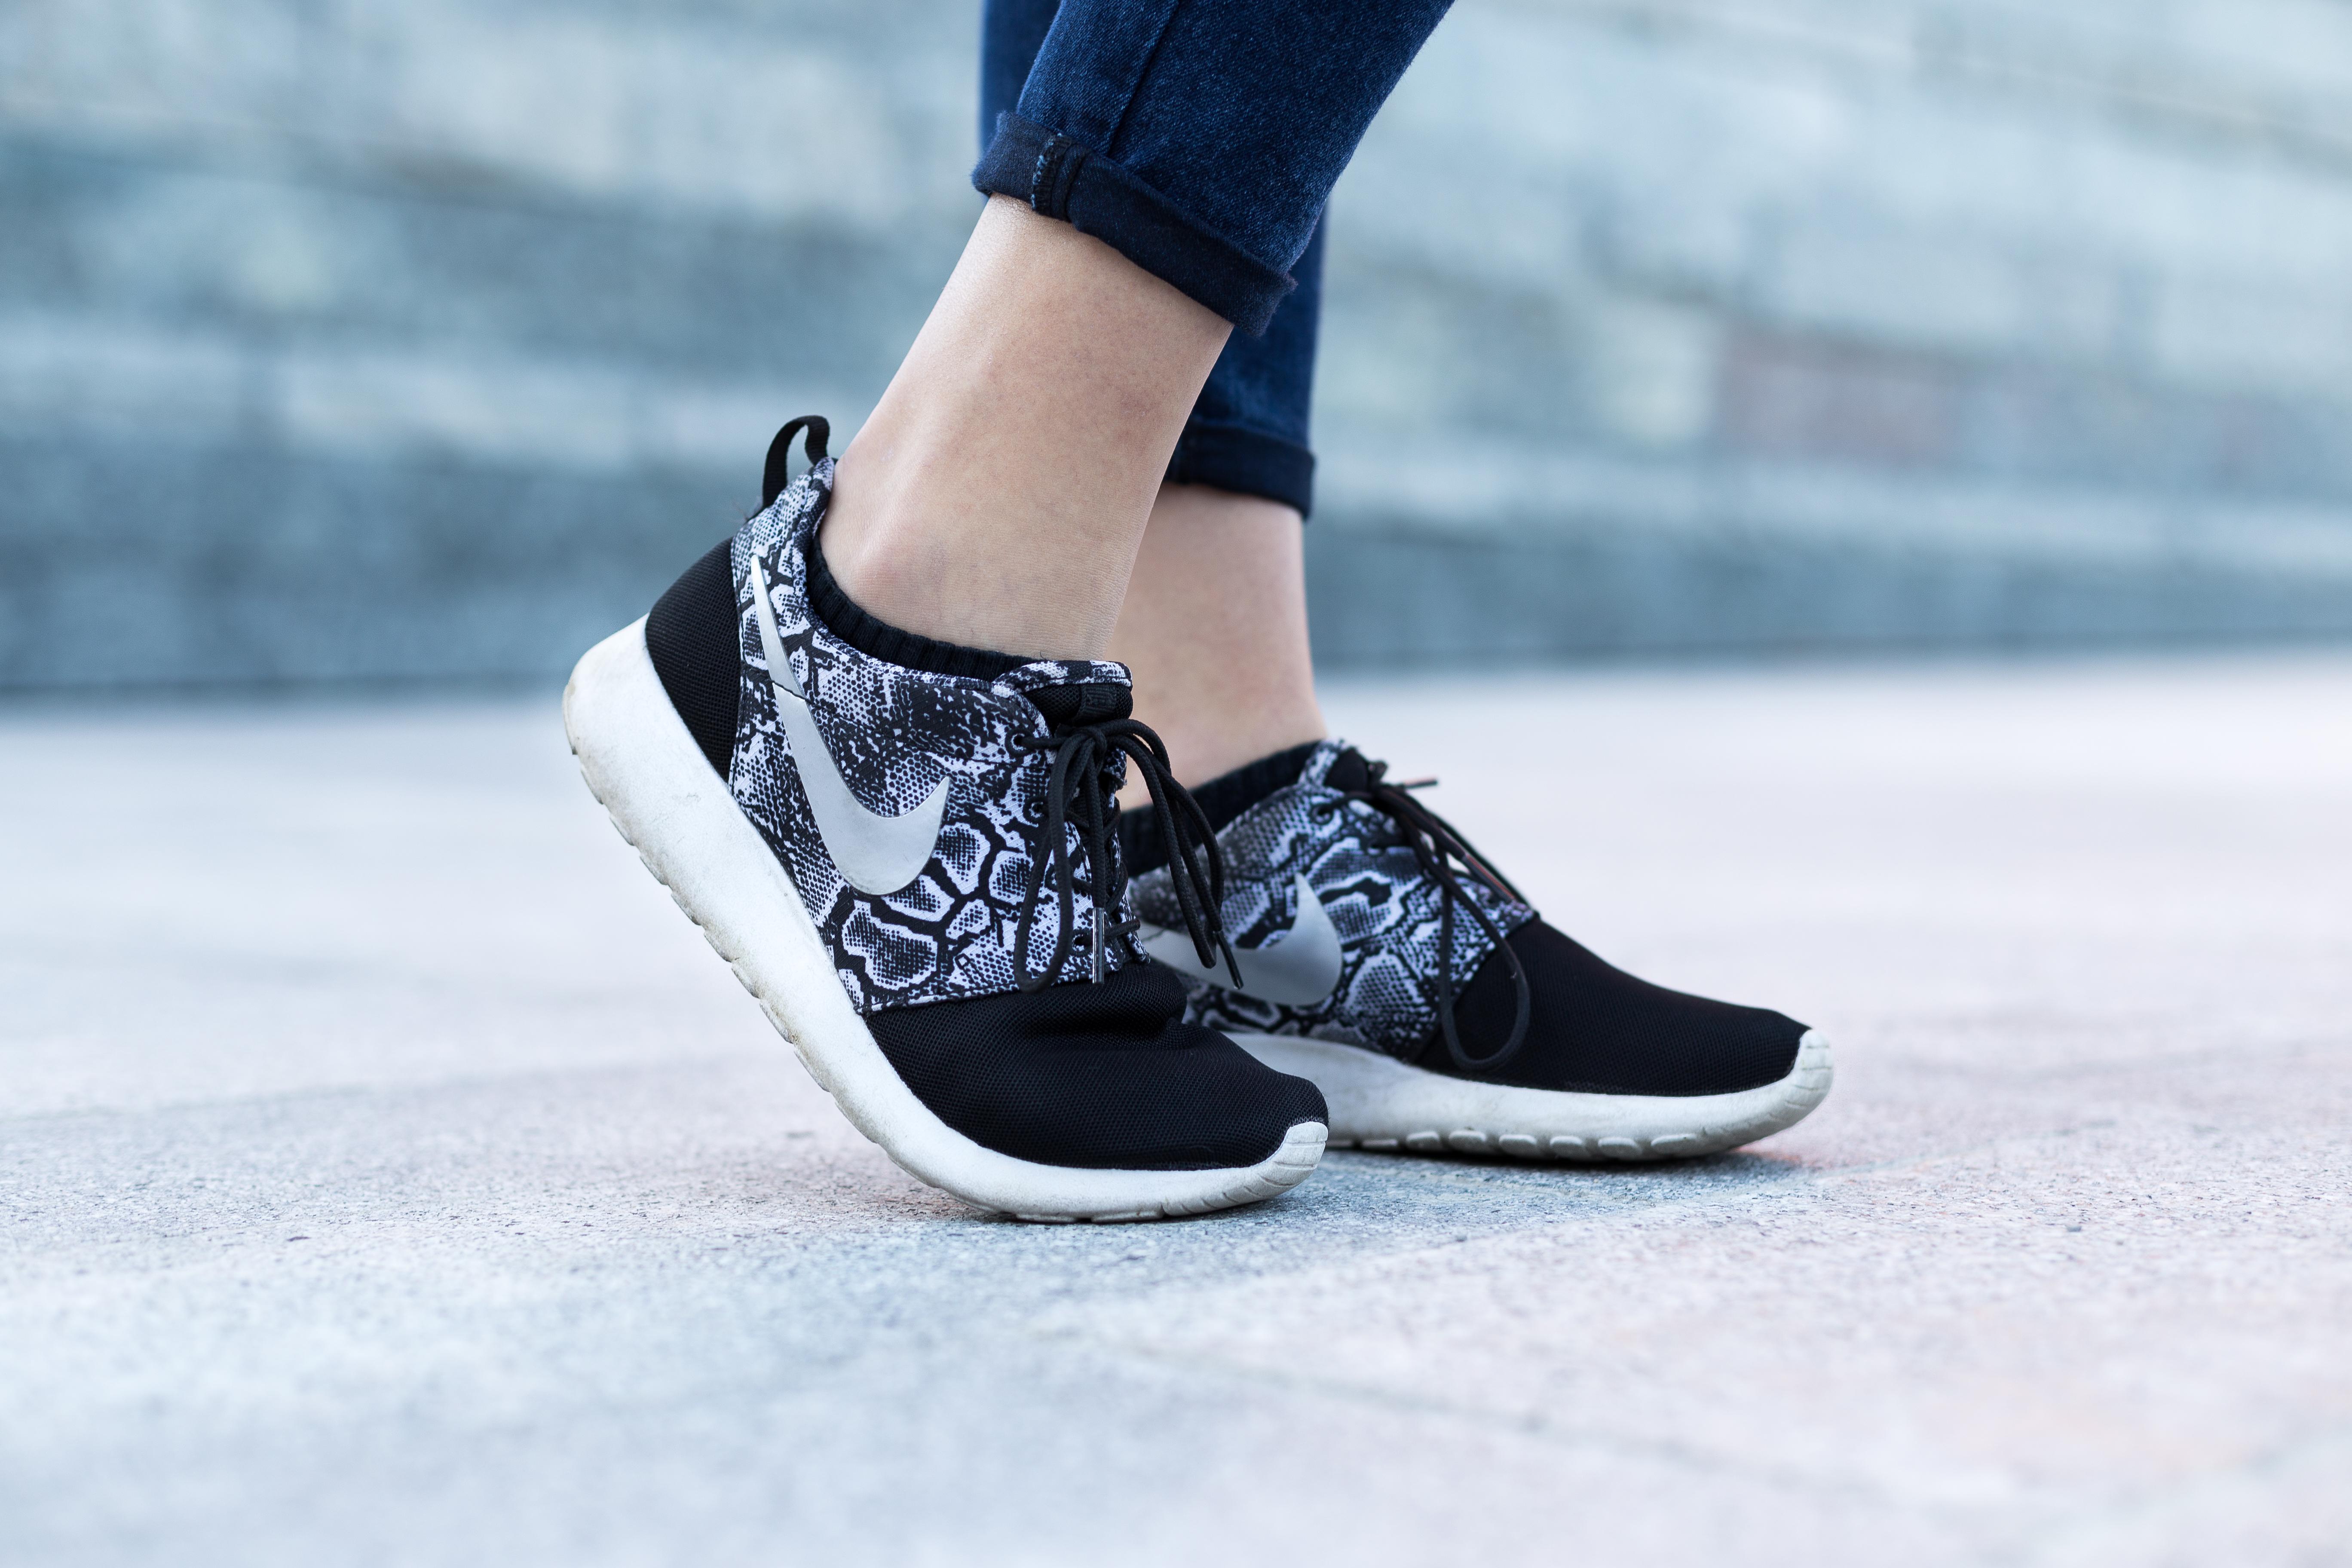 Chaussures bleues Fashion fille CBoJS